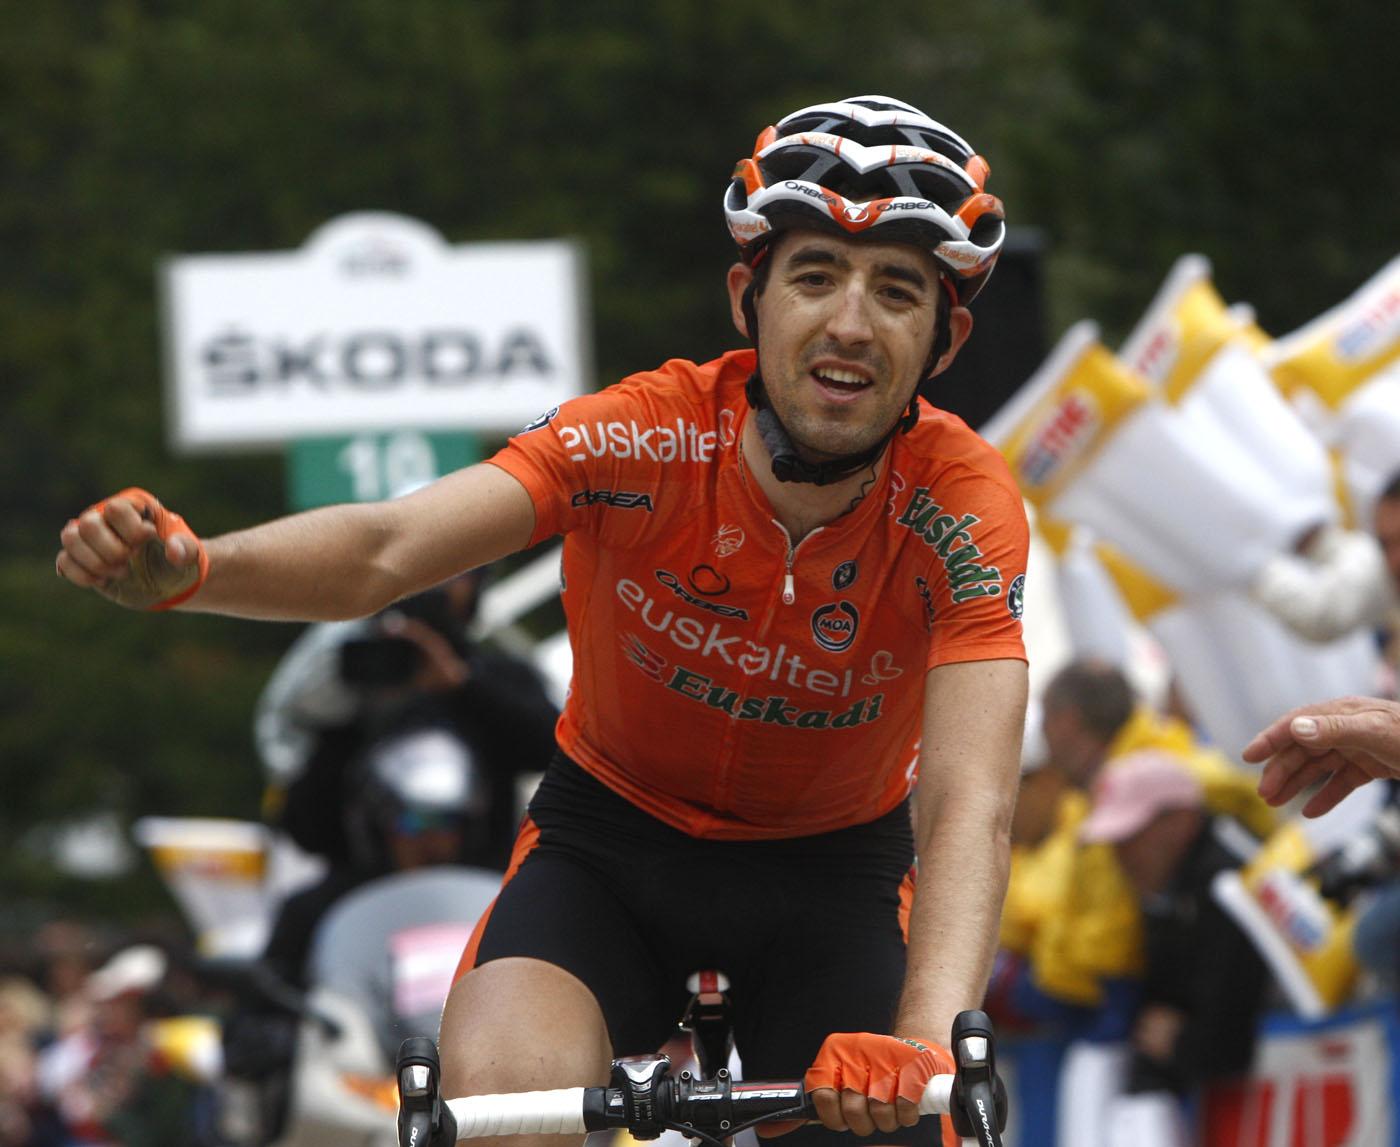 Mikel Nieve wins, Giro d